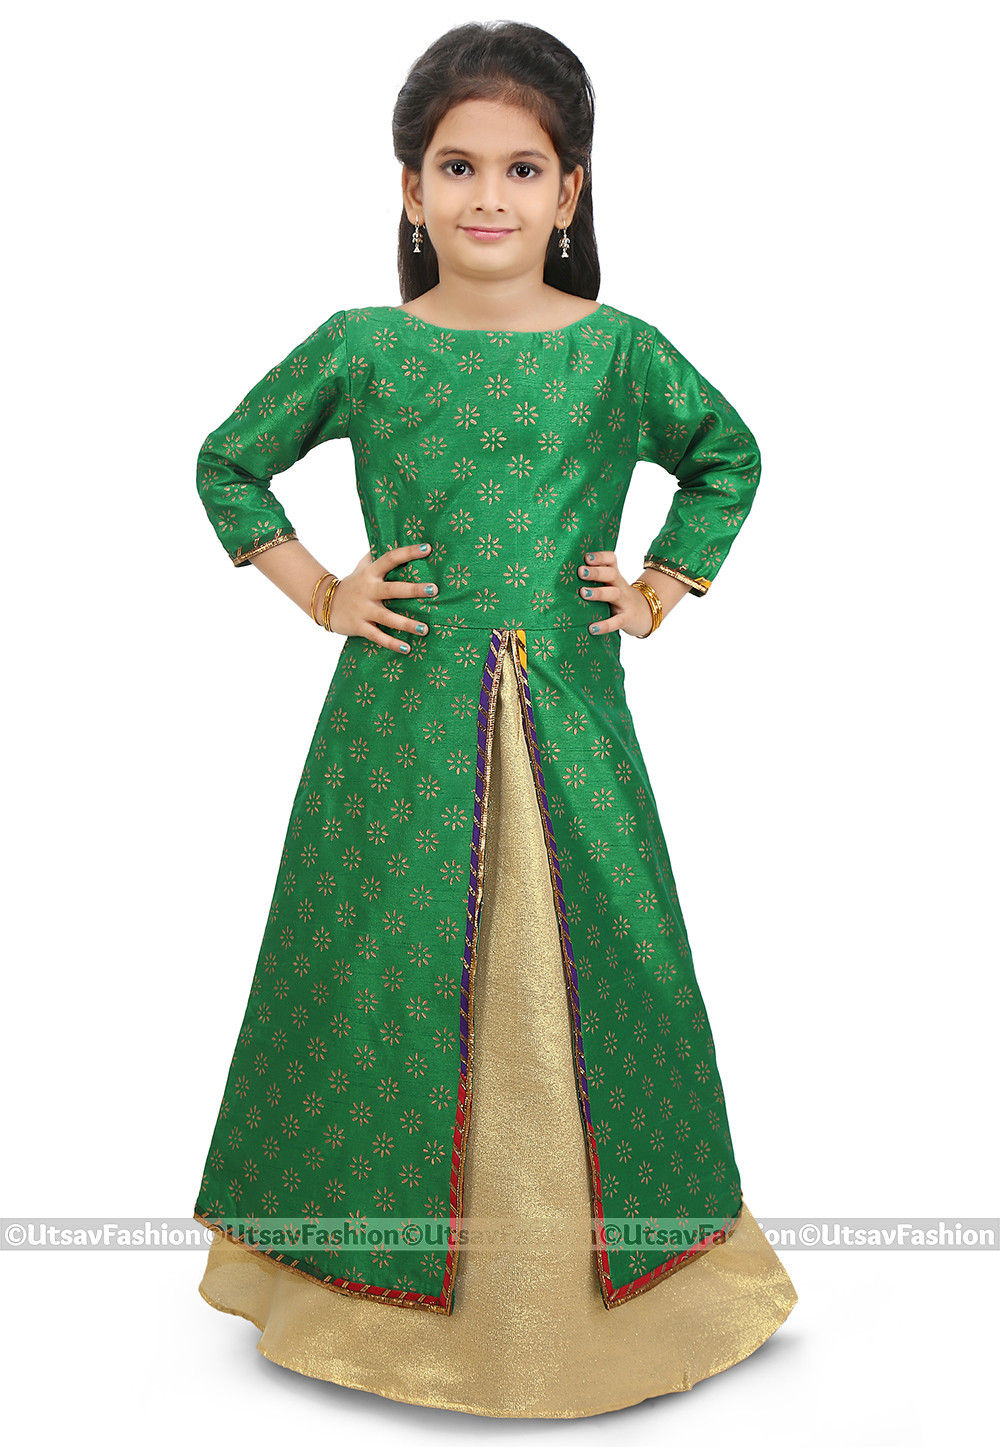 Block Printed Dupion Silk Jacket Style Lehenga in Green